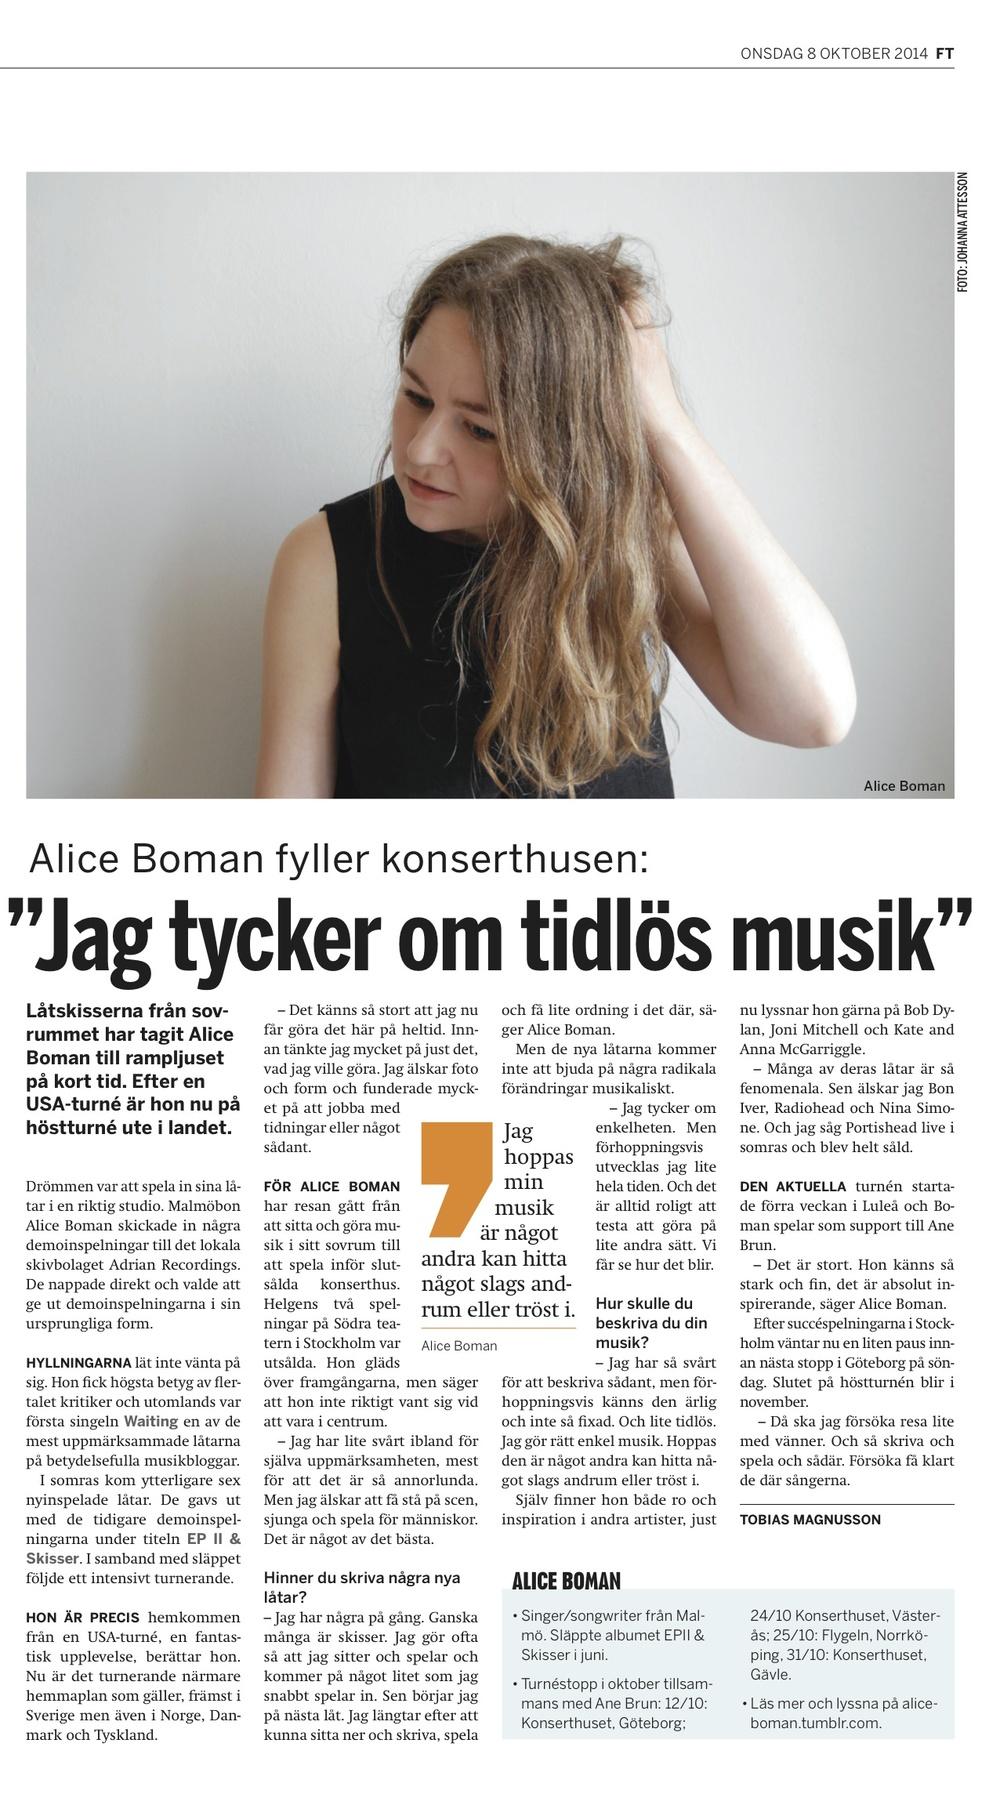 Fria tidning intervju - Alice Boman.jpg